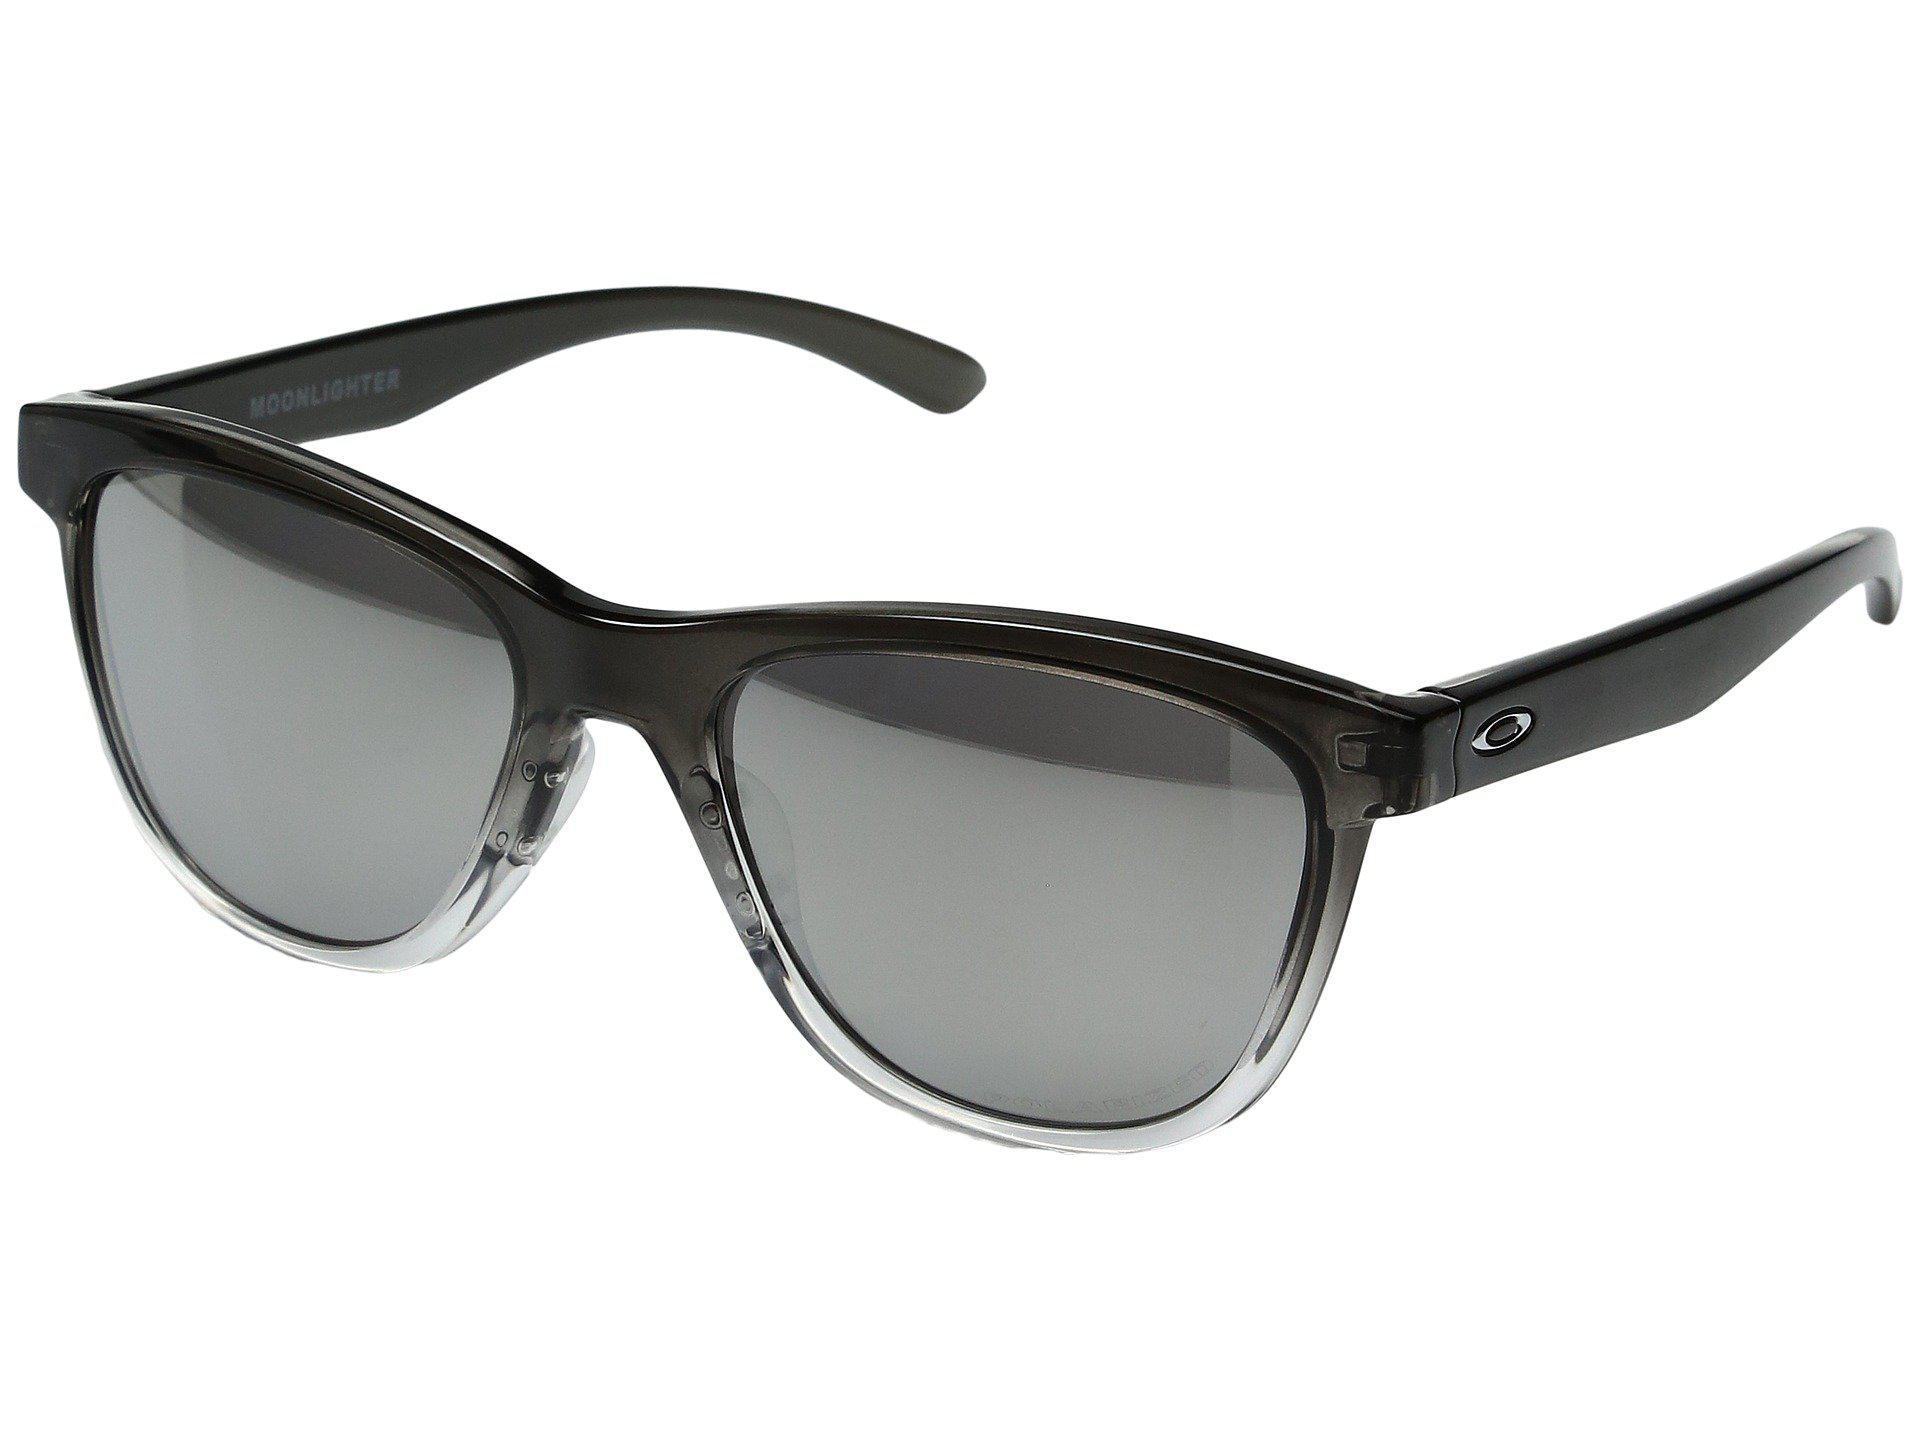 34e26dc6ac Oakley. Women s Black Moonlighter (tortoise brown Gradient Polarized)  Plastic Frame Fashion Sunglasses